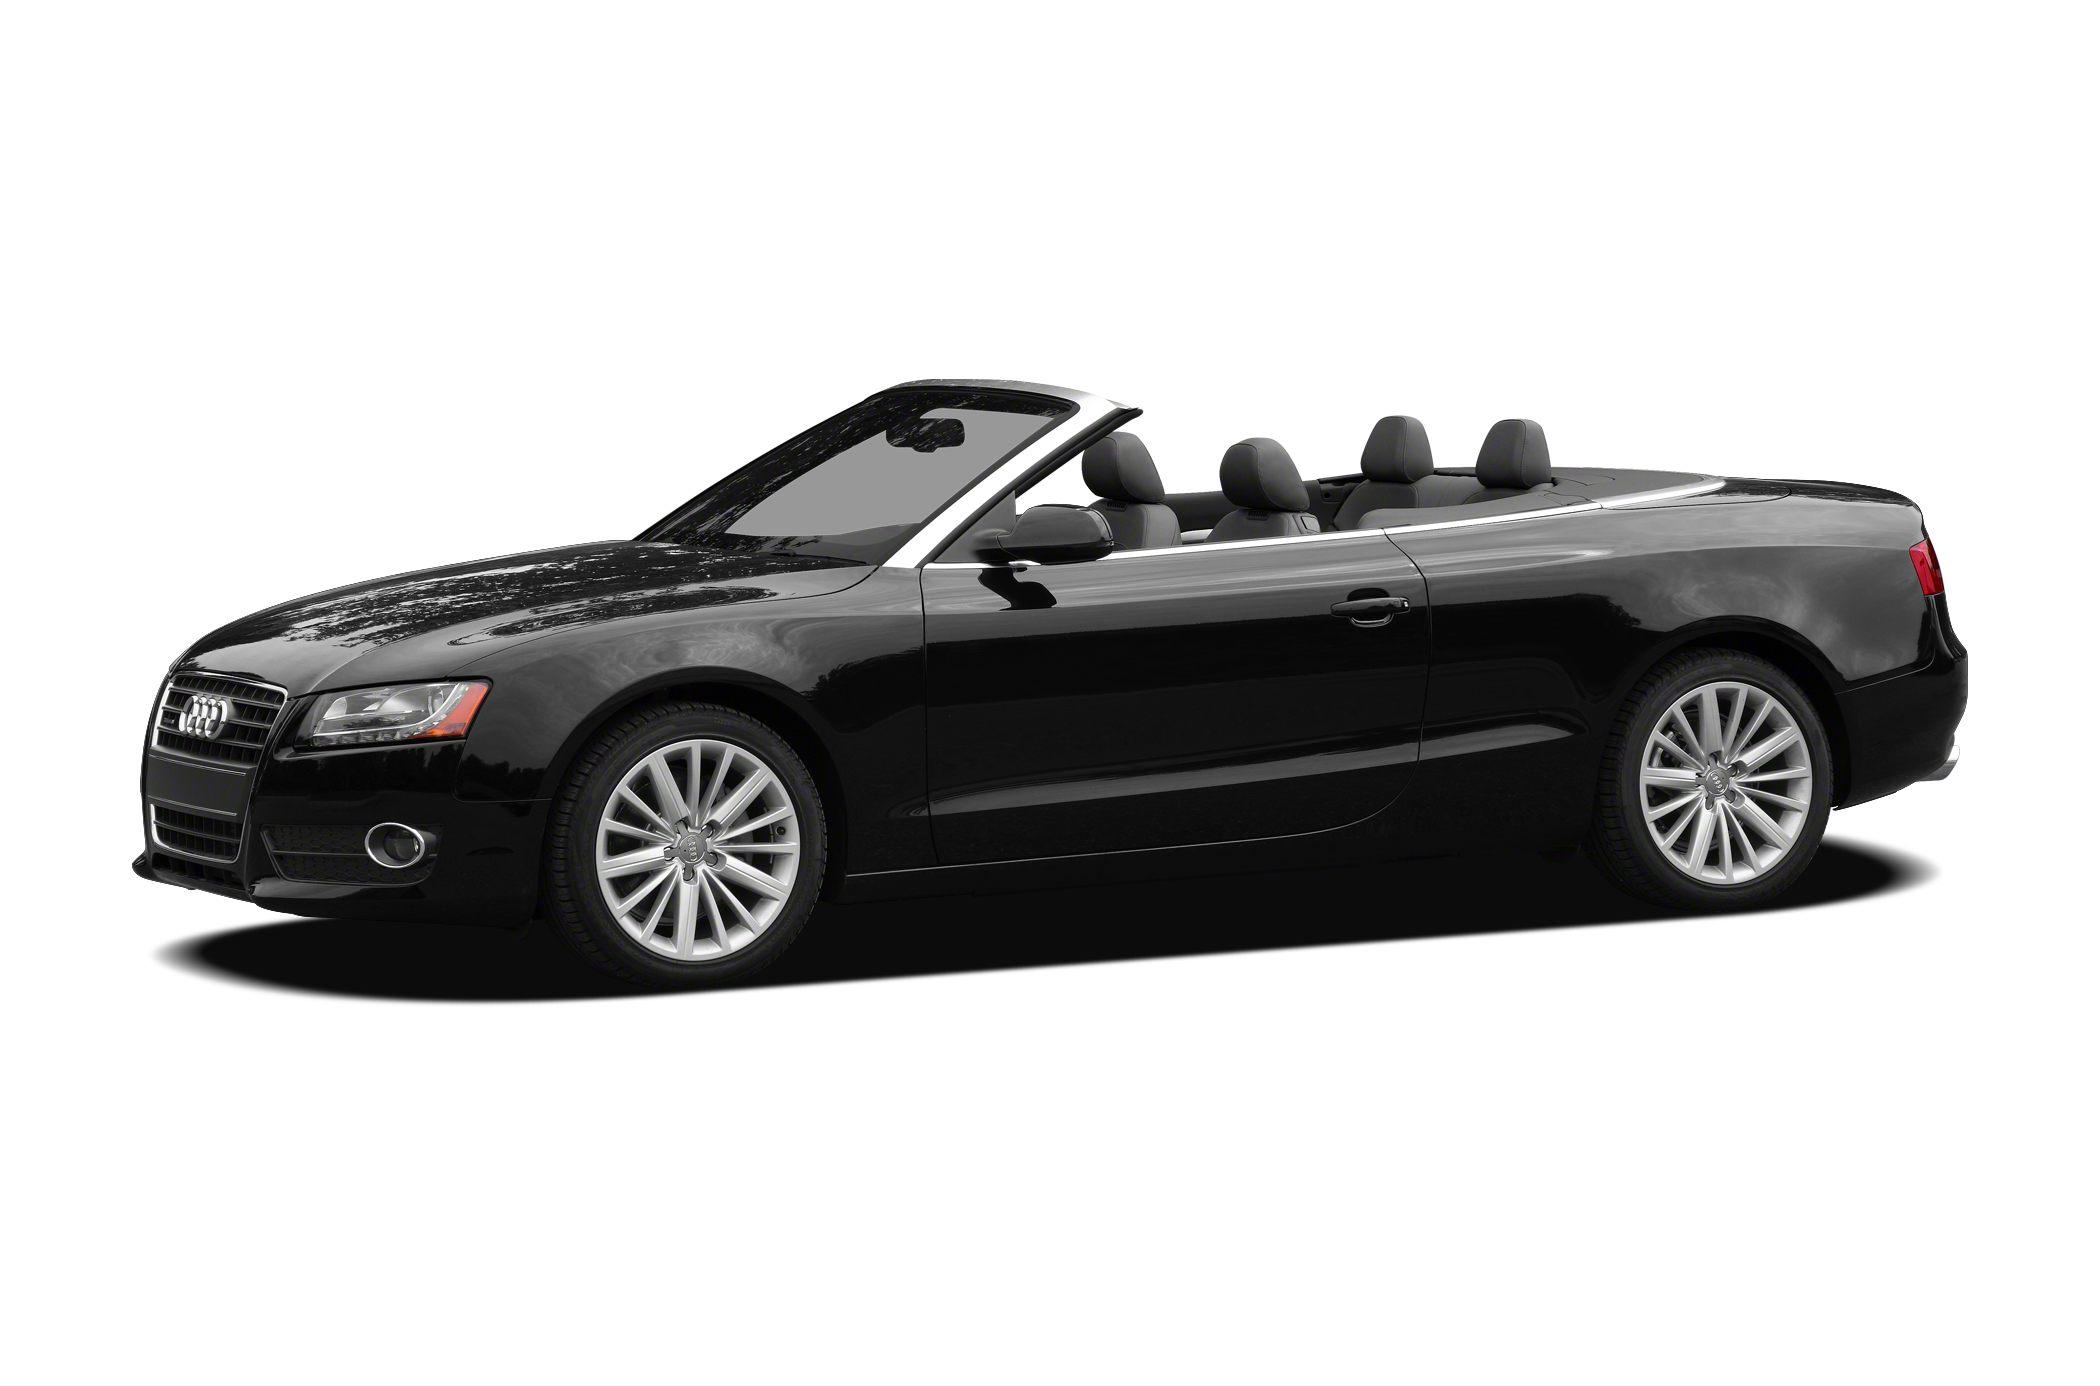 2010 Audi A5 2 0T Premium 2dr All wheel Drive quattro Cabriolet